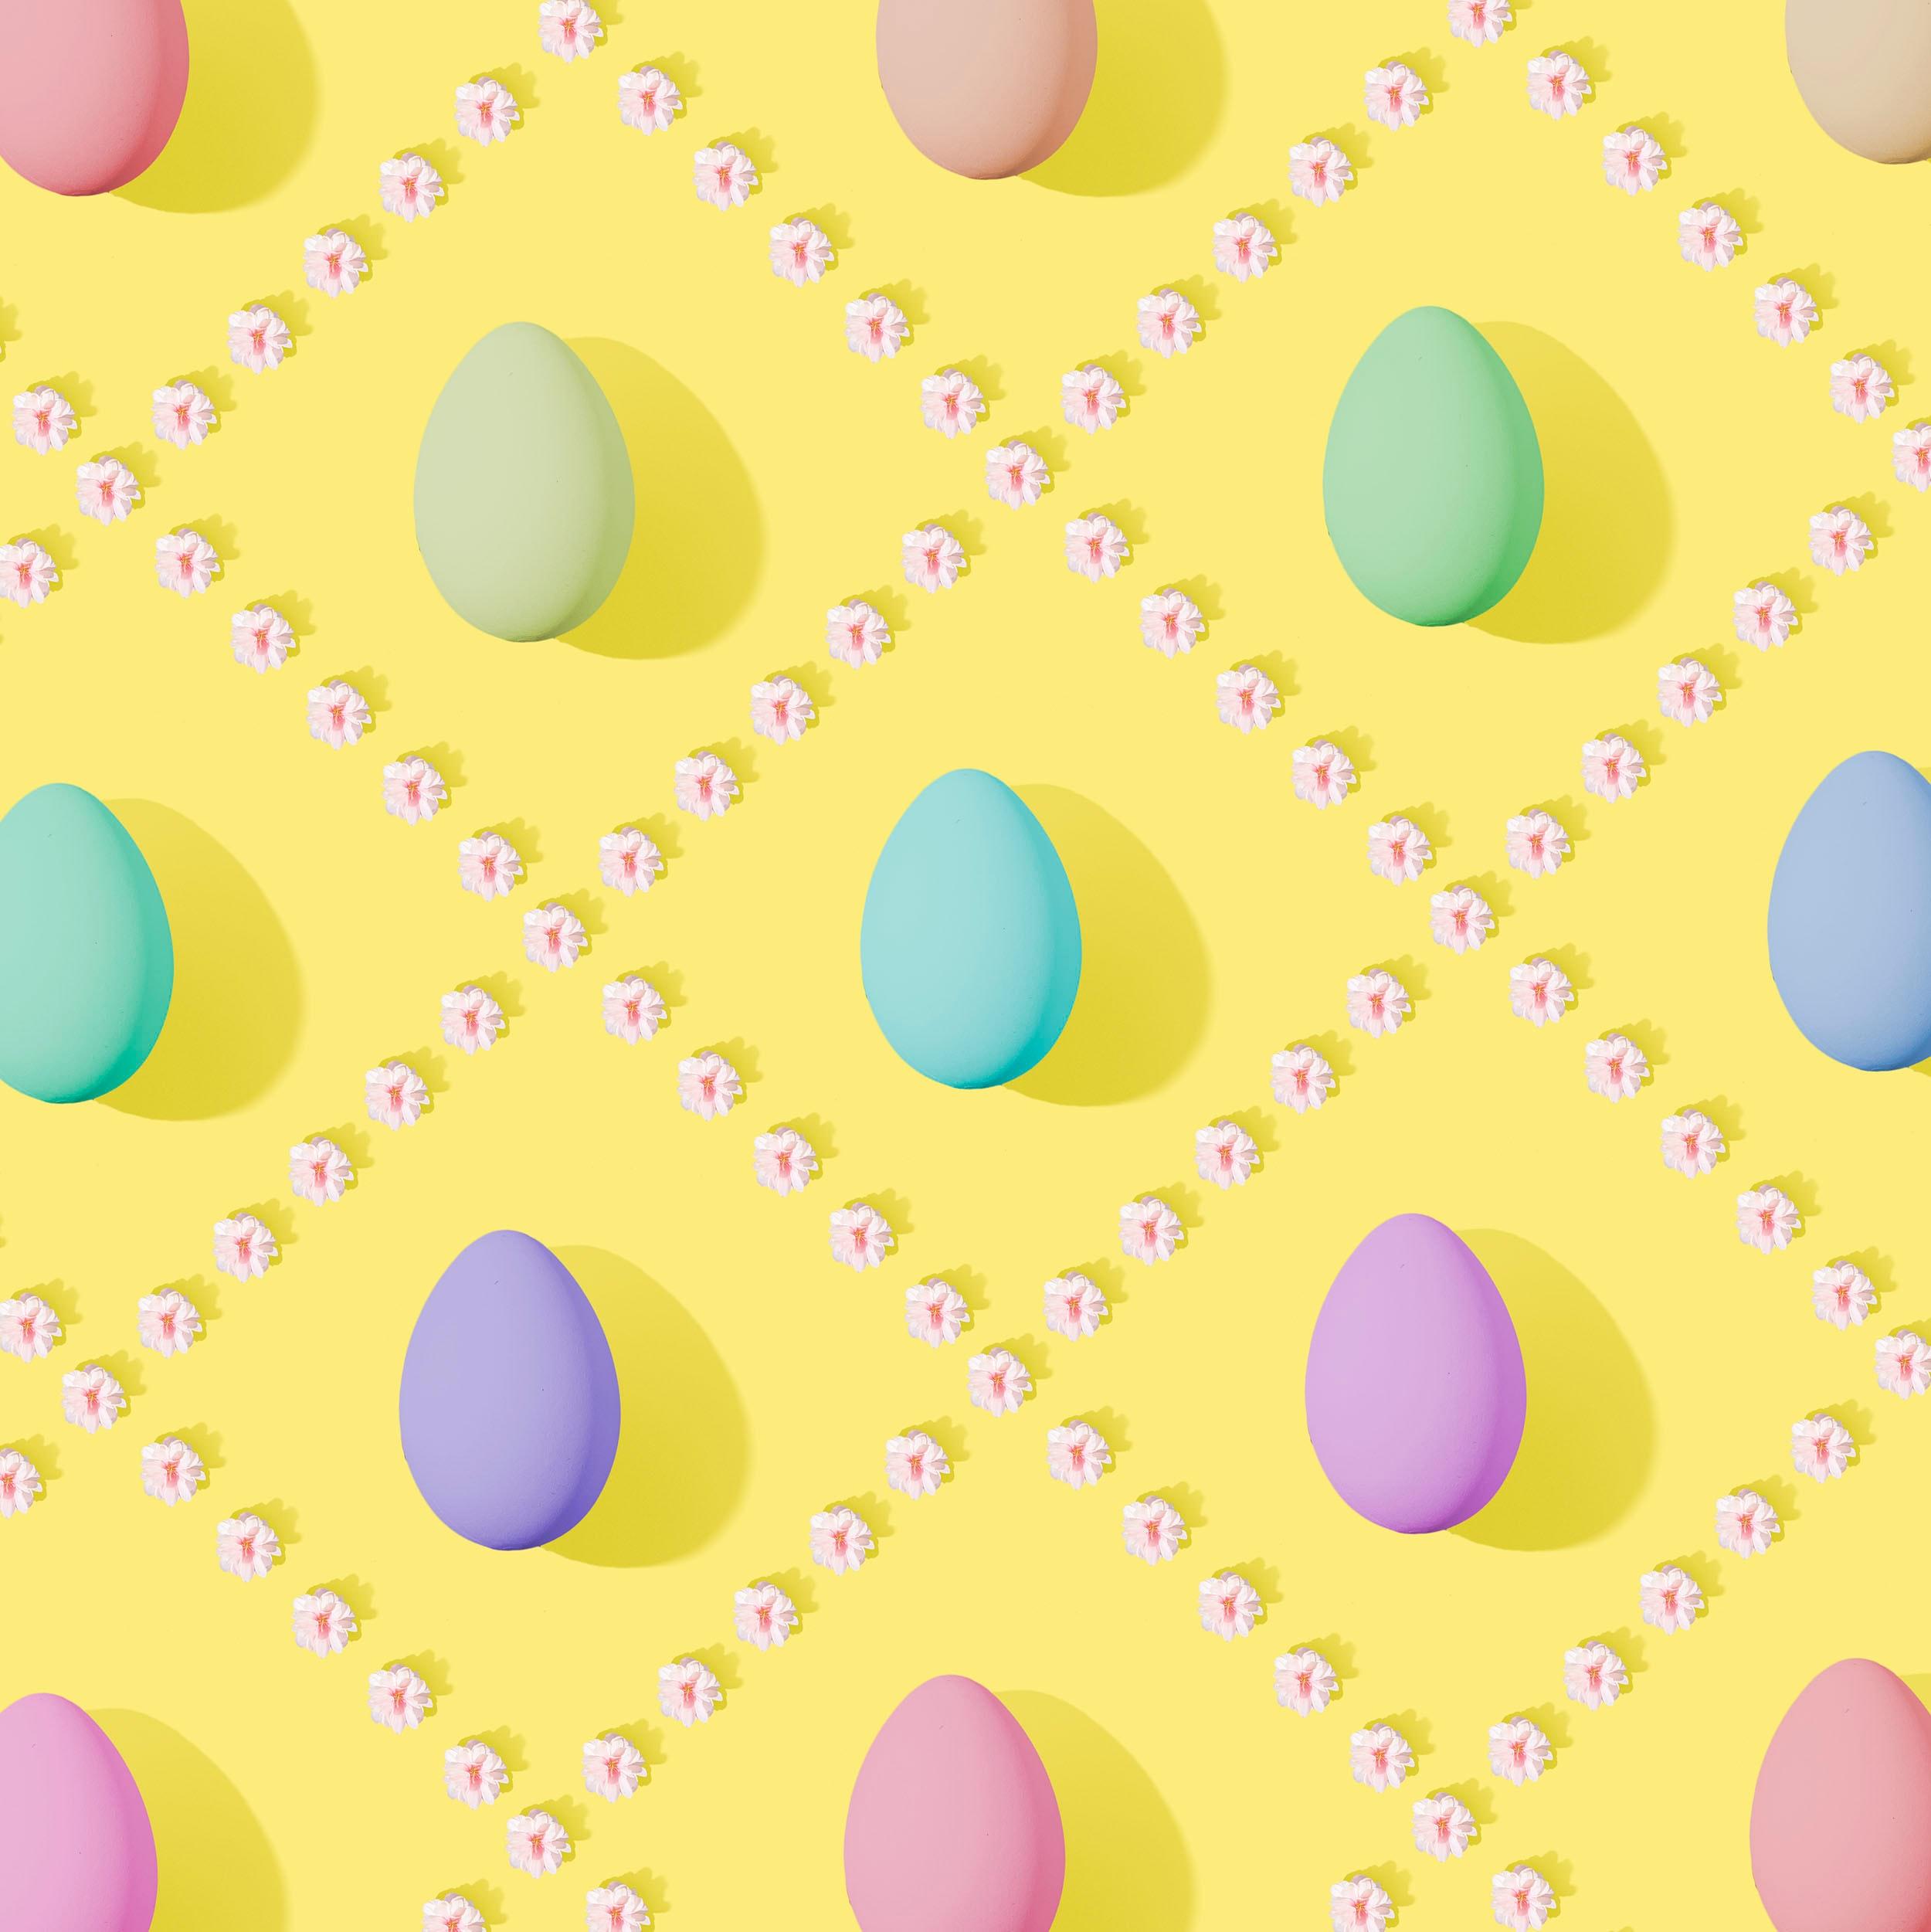 108999 descargar fondo de pantalla Vacaciones, Huevos De Pascua, Multicolor, Abigarrado, Pascua, Huevos: protectores de pantalla e imágenes gratis